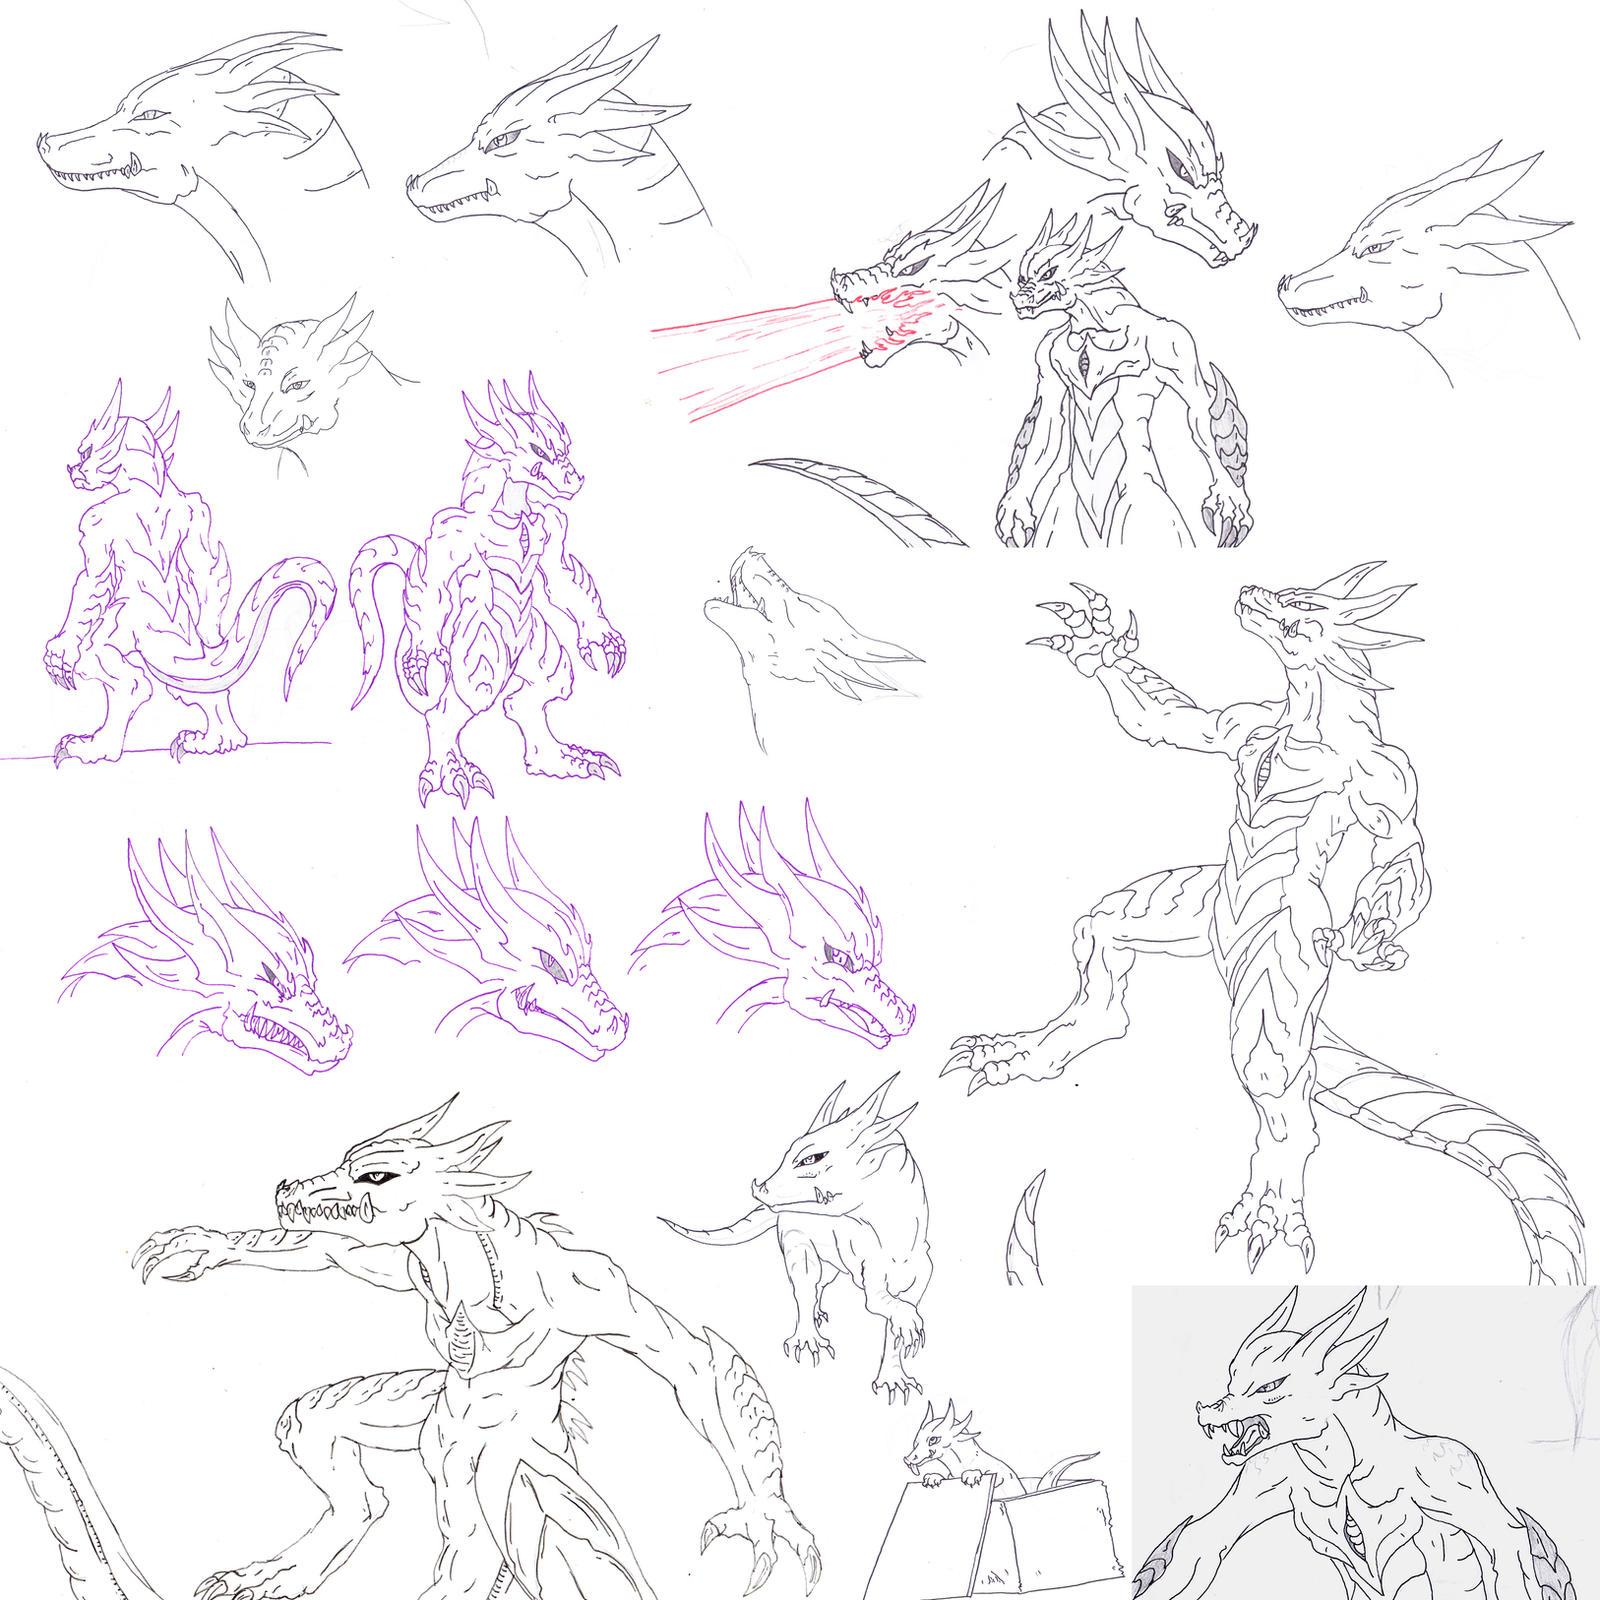 Kaiju: Slierus Sketches by Cyprus-1